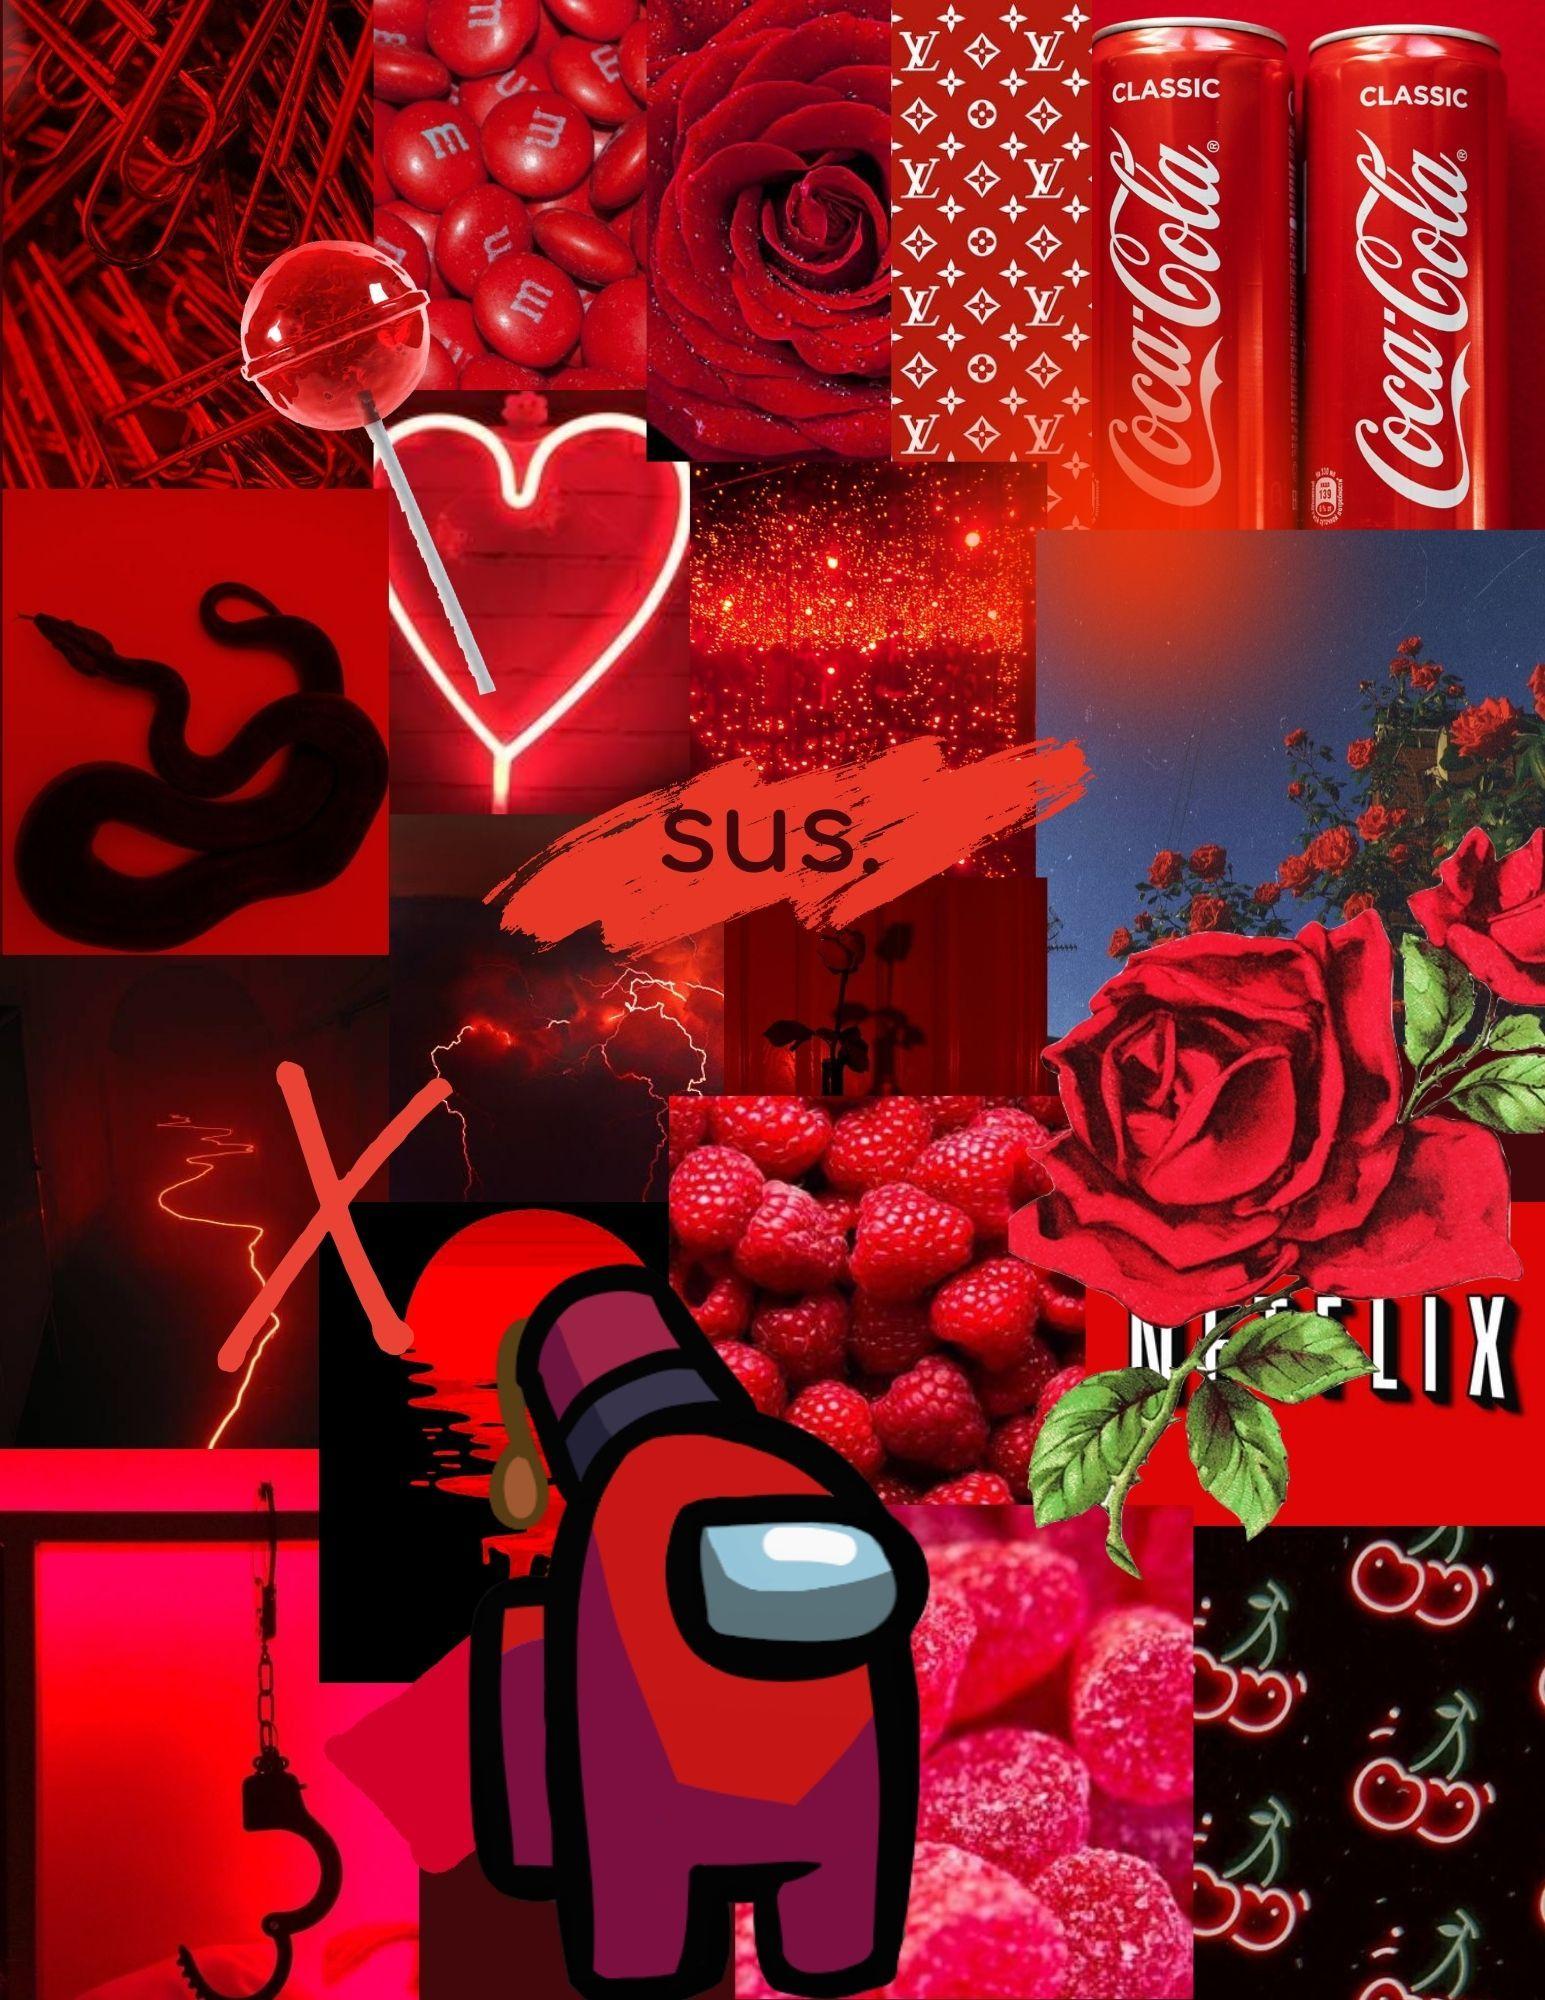 Red Among Us Iphone Wallpaper Girly Wallpaper Iphone Cute Cute Emoji Wallpaper